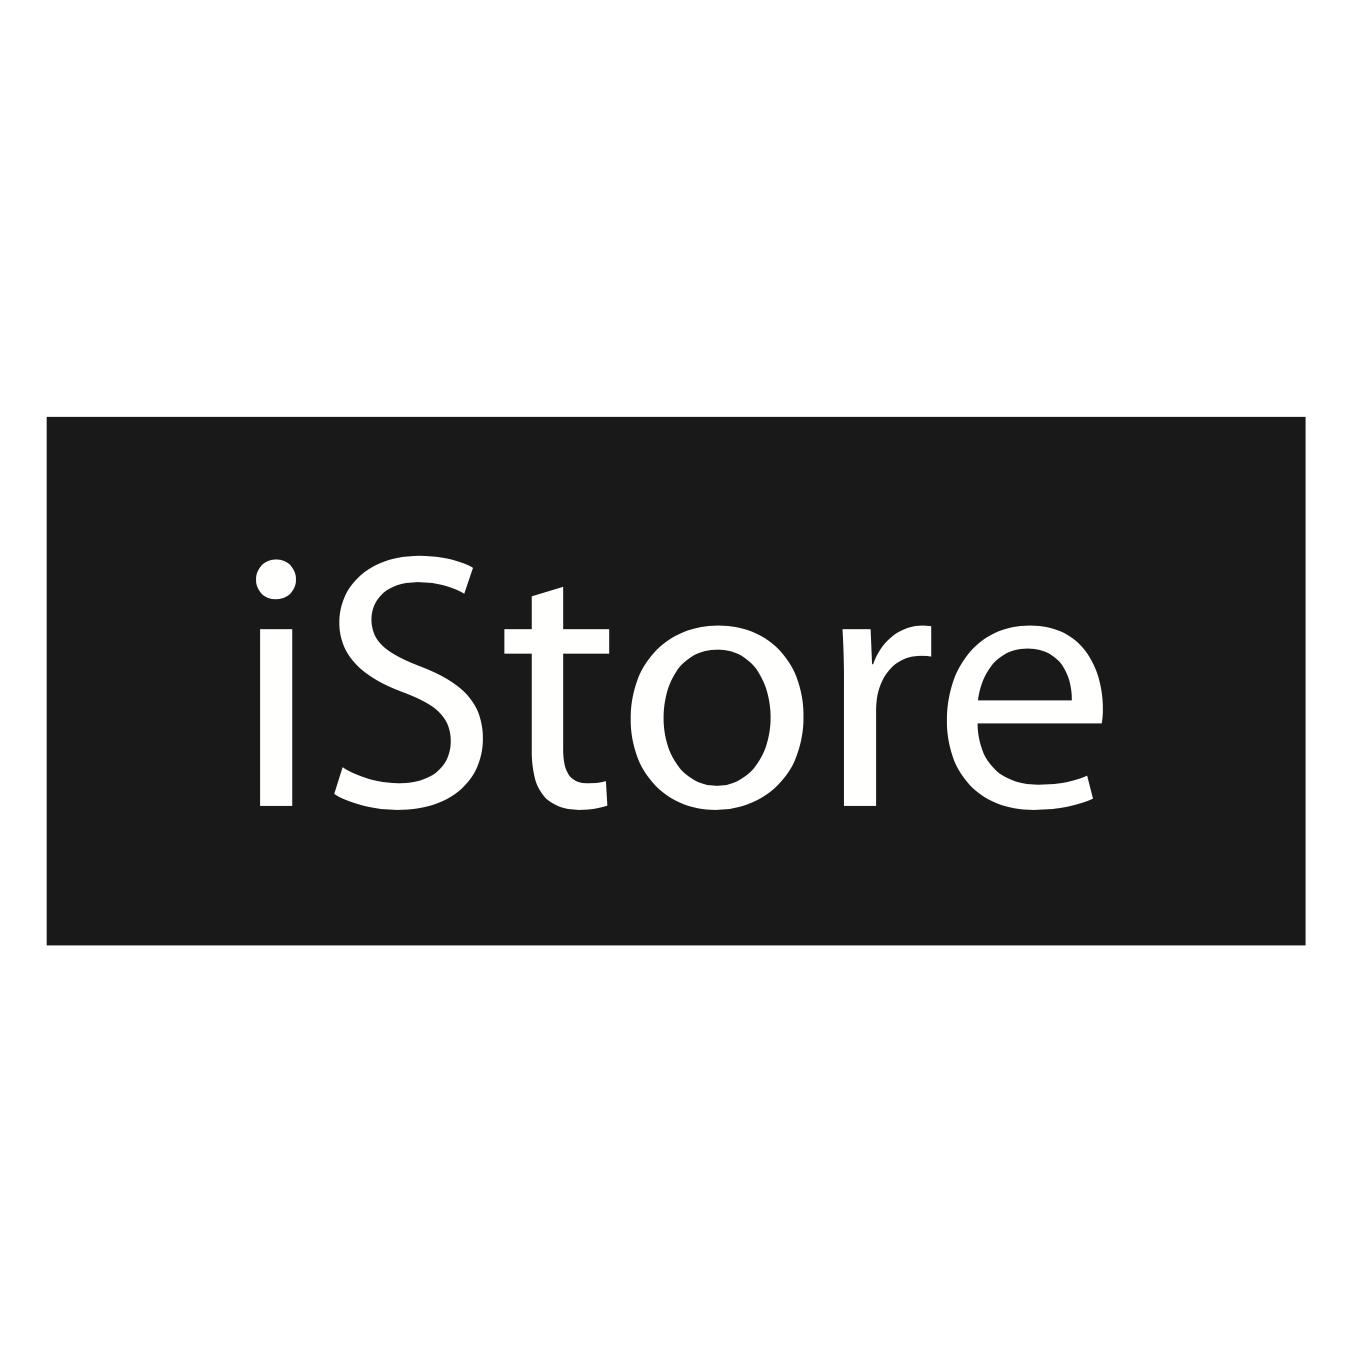 iPhone 8 / 7 Silicone Case - Marine Green